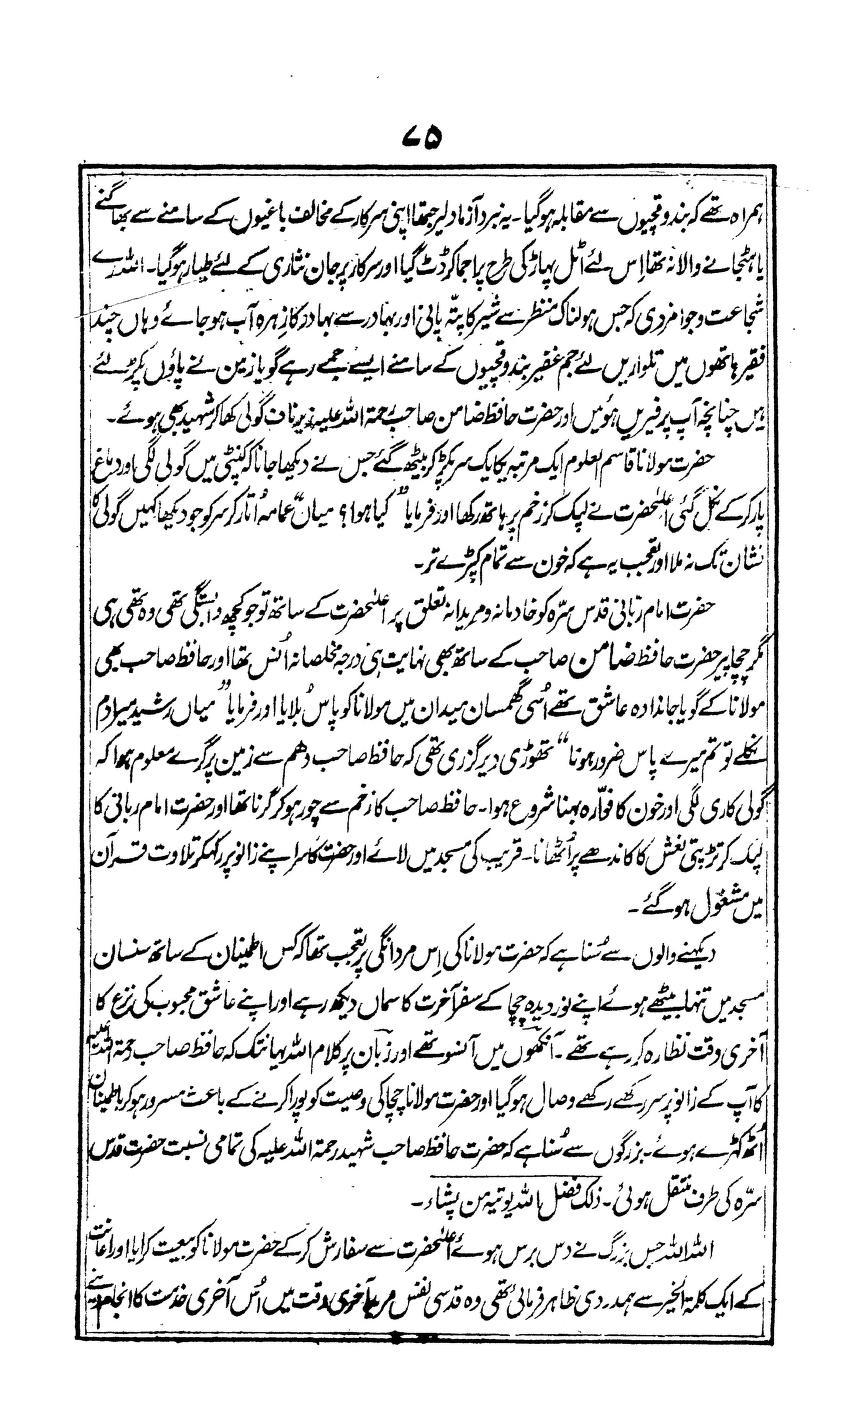 Tazkira-Tur-Rasheed-Jild-1_0076.jpg